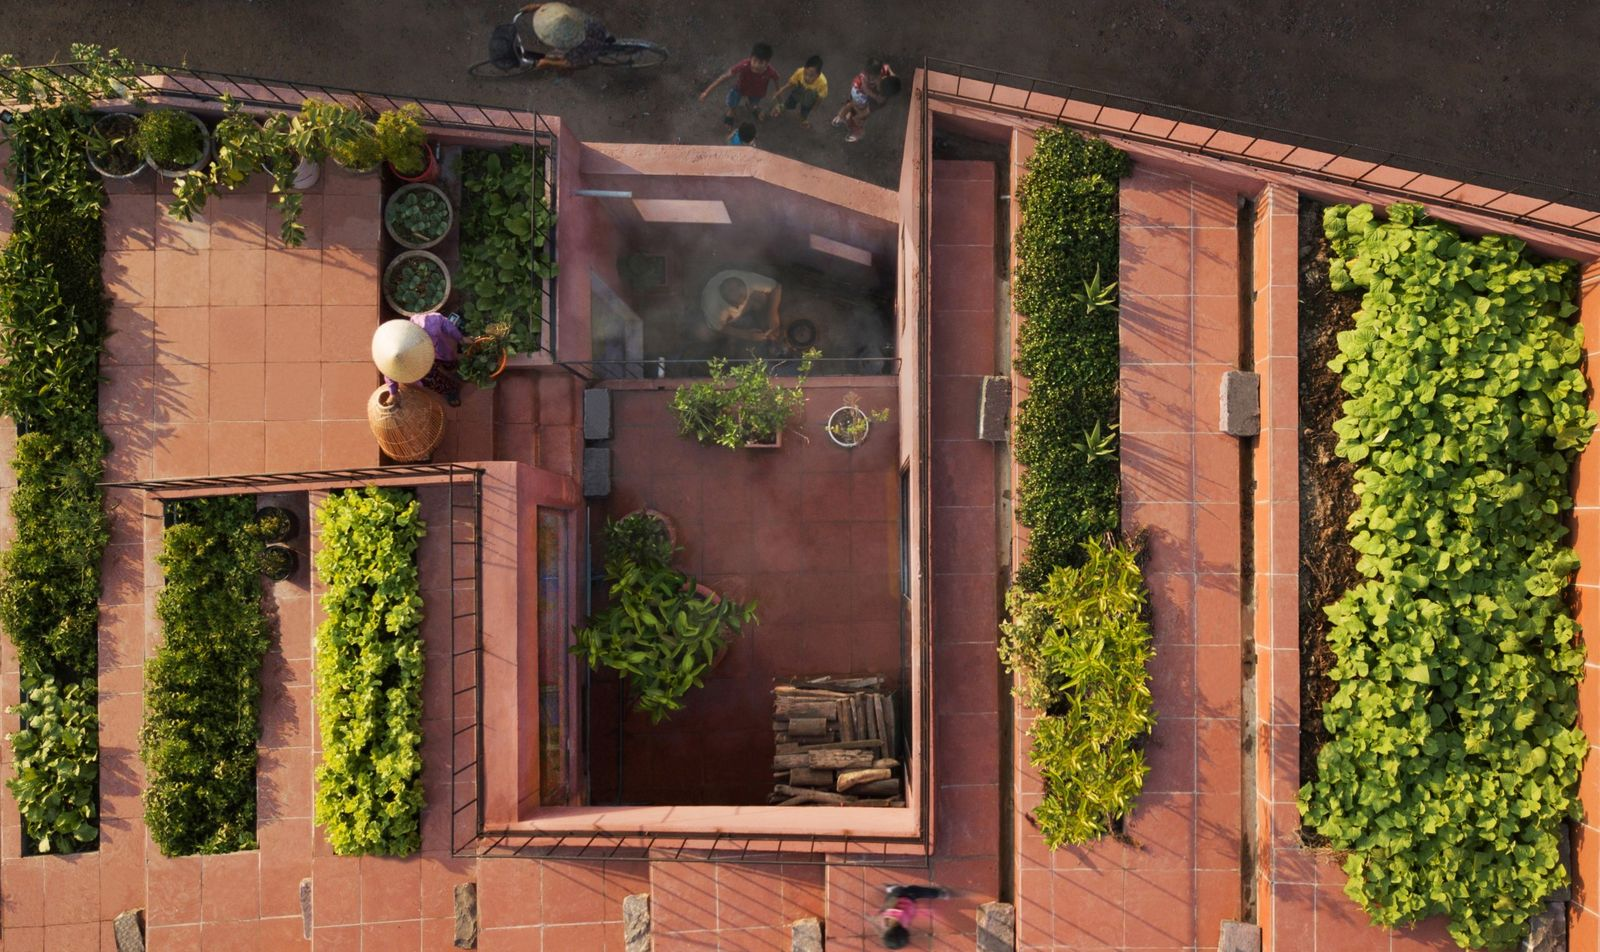 Dezeen Awards 2020 Red Roof by TAA Design